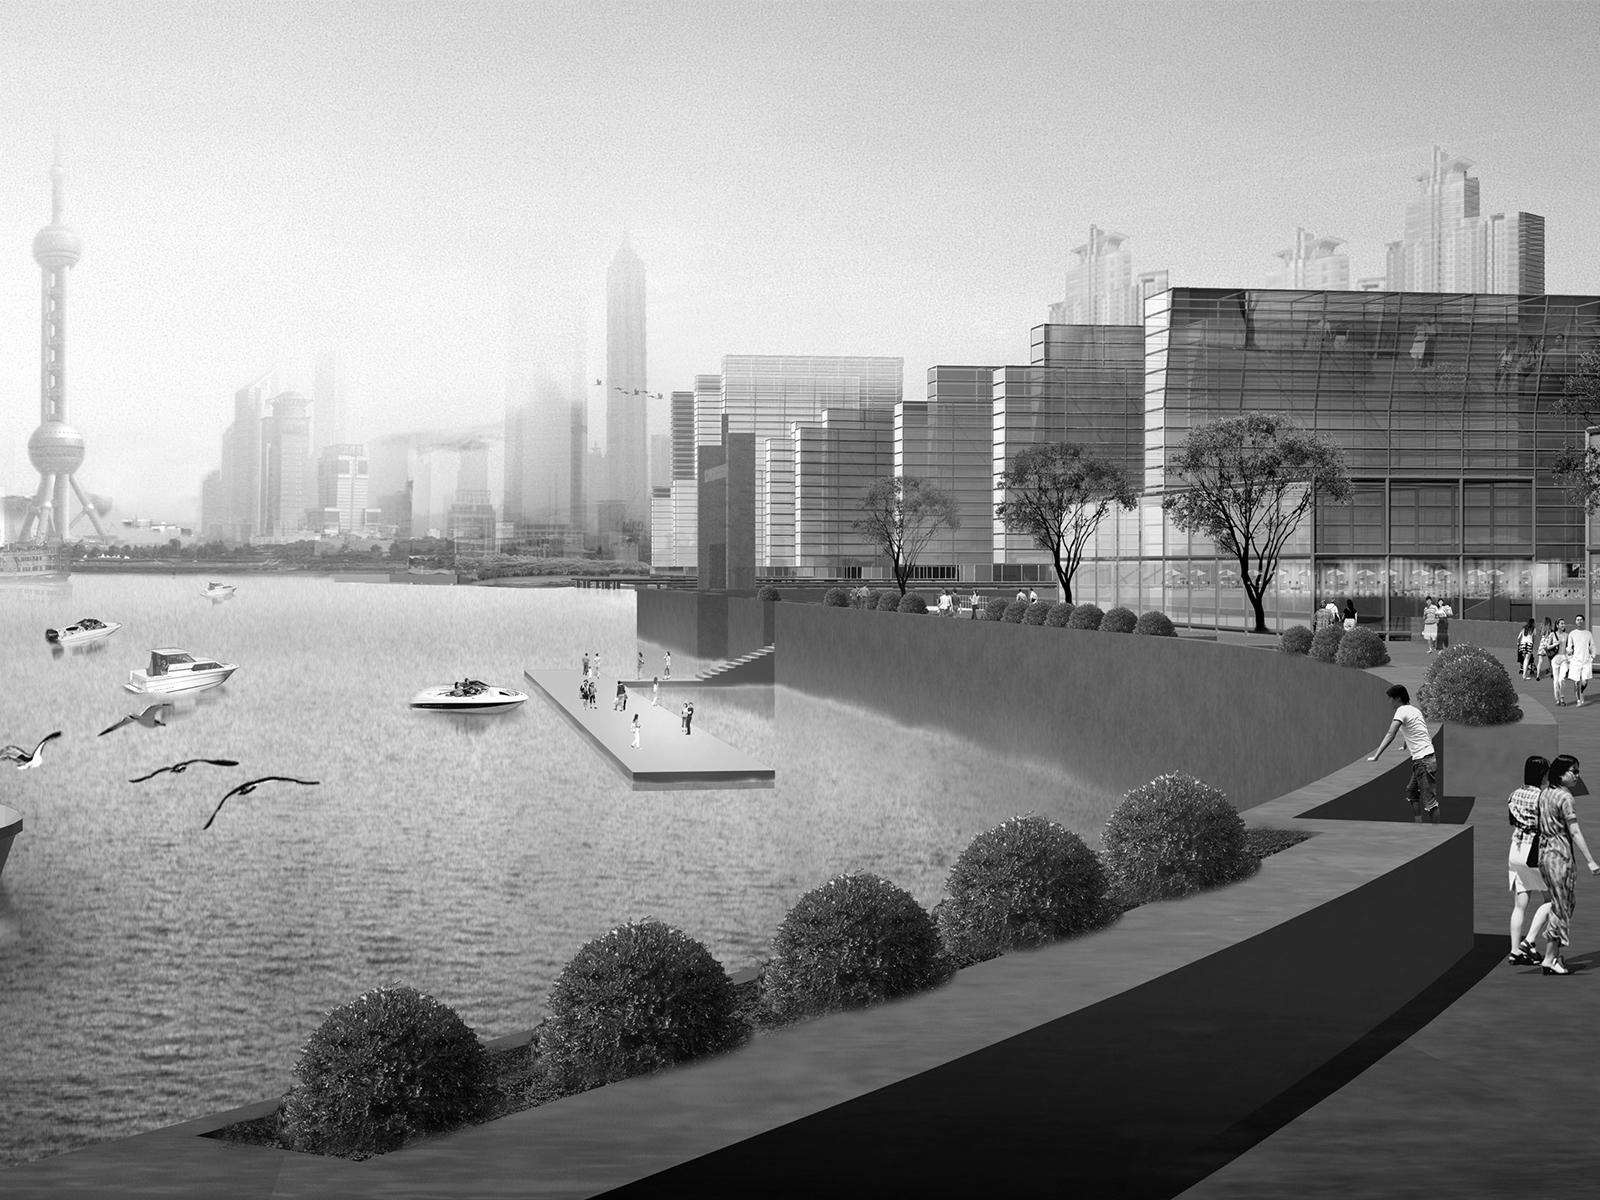 上海世博村(E18地块)规划及城市设计_2010 Shanghai EXPO Village Planning_Right_02.jpg